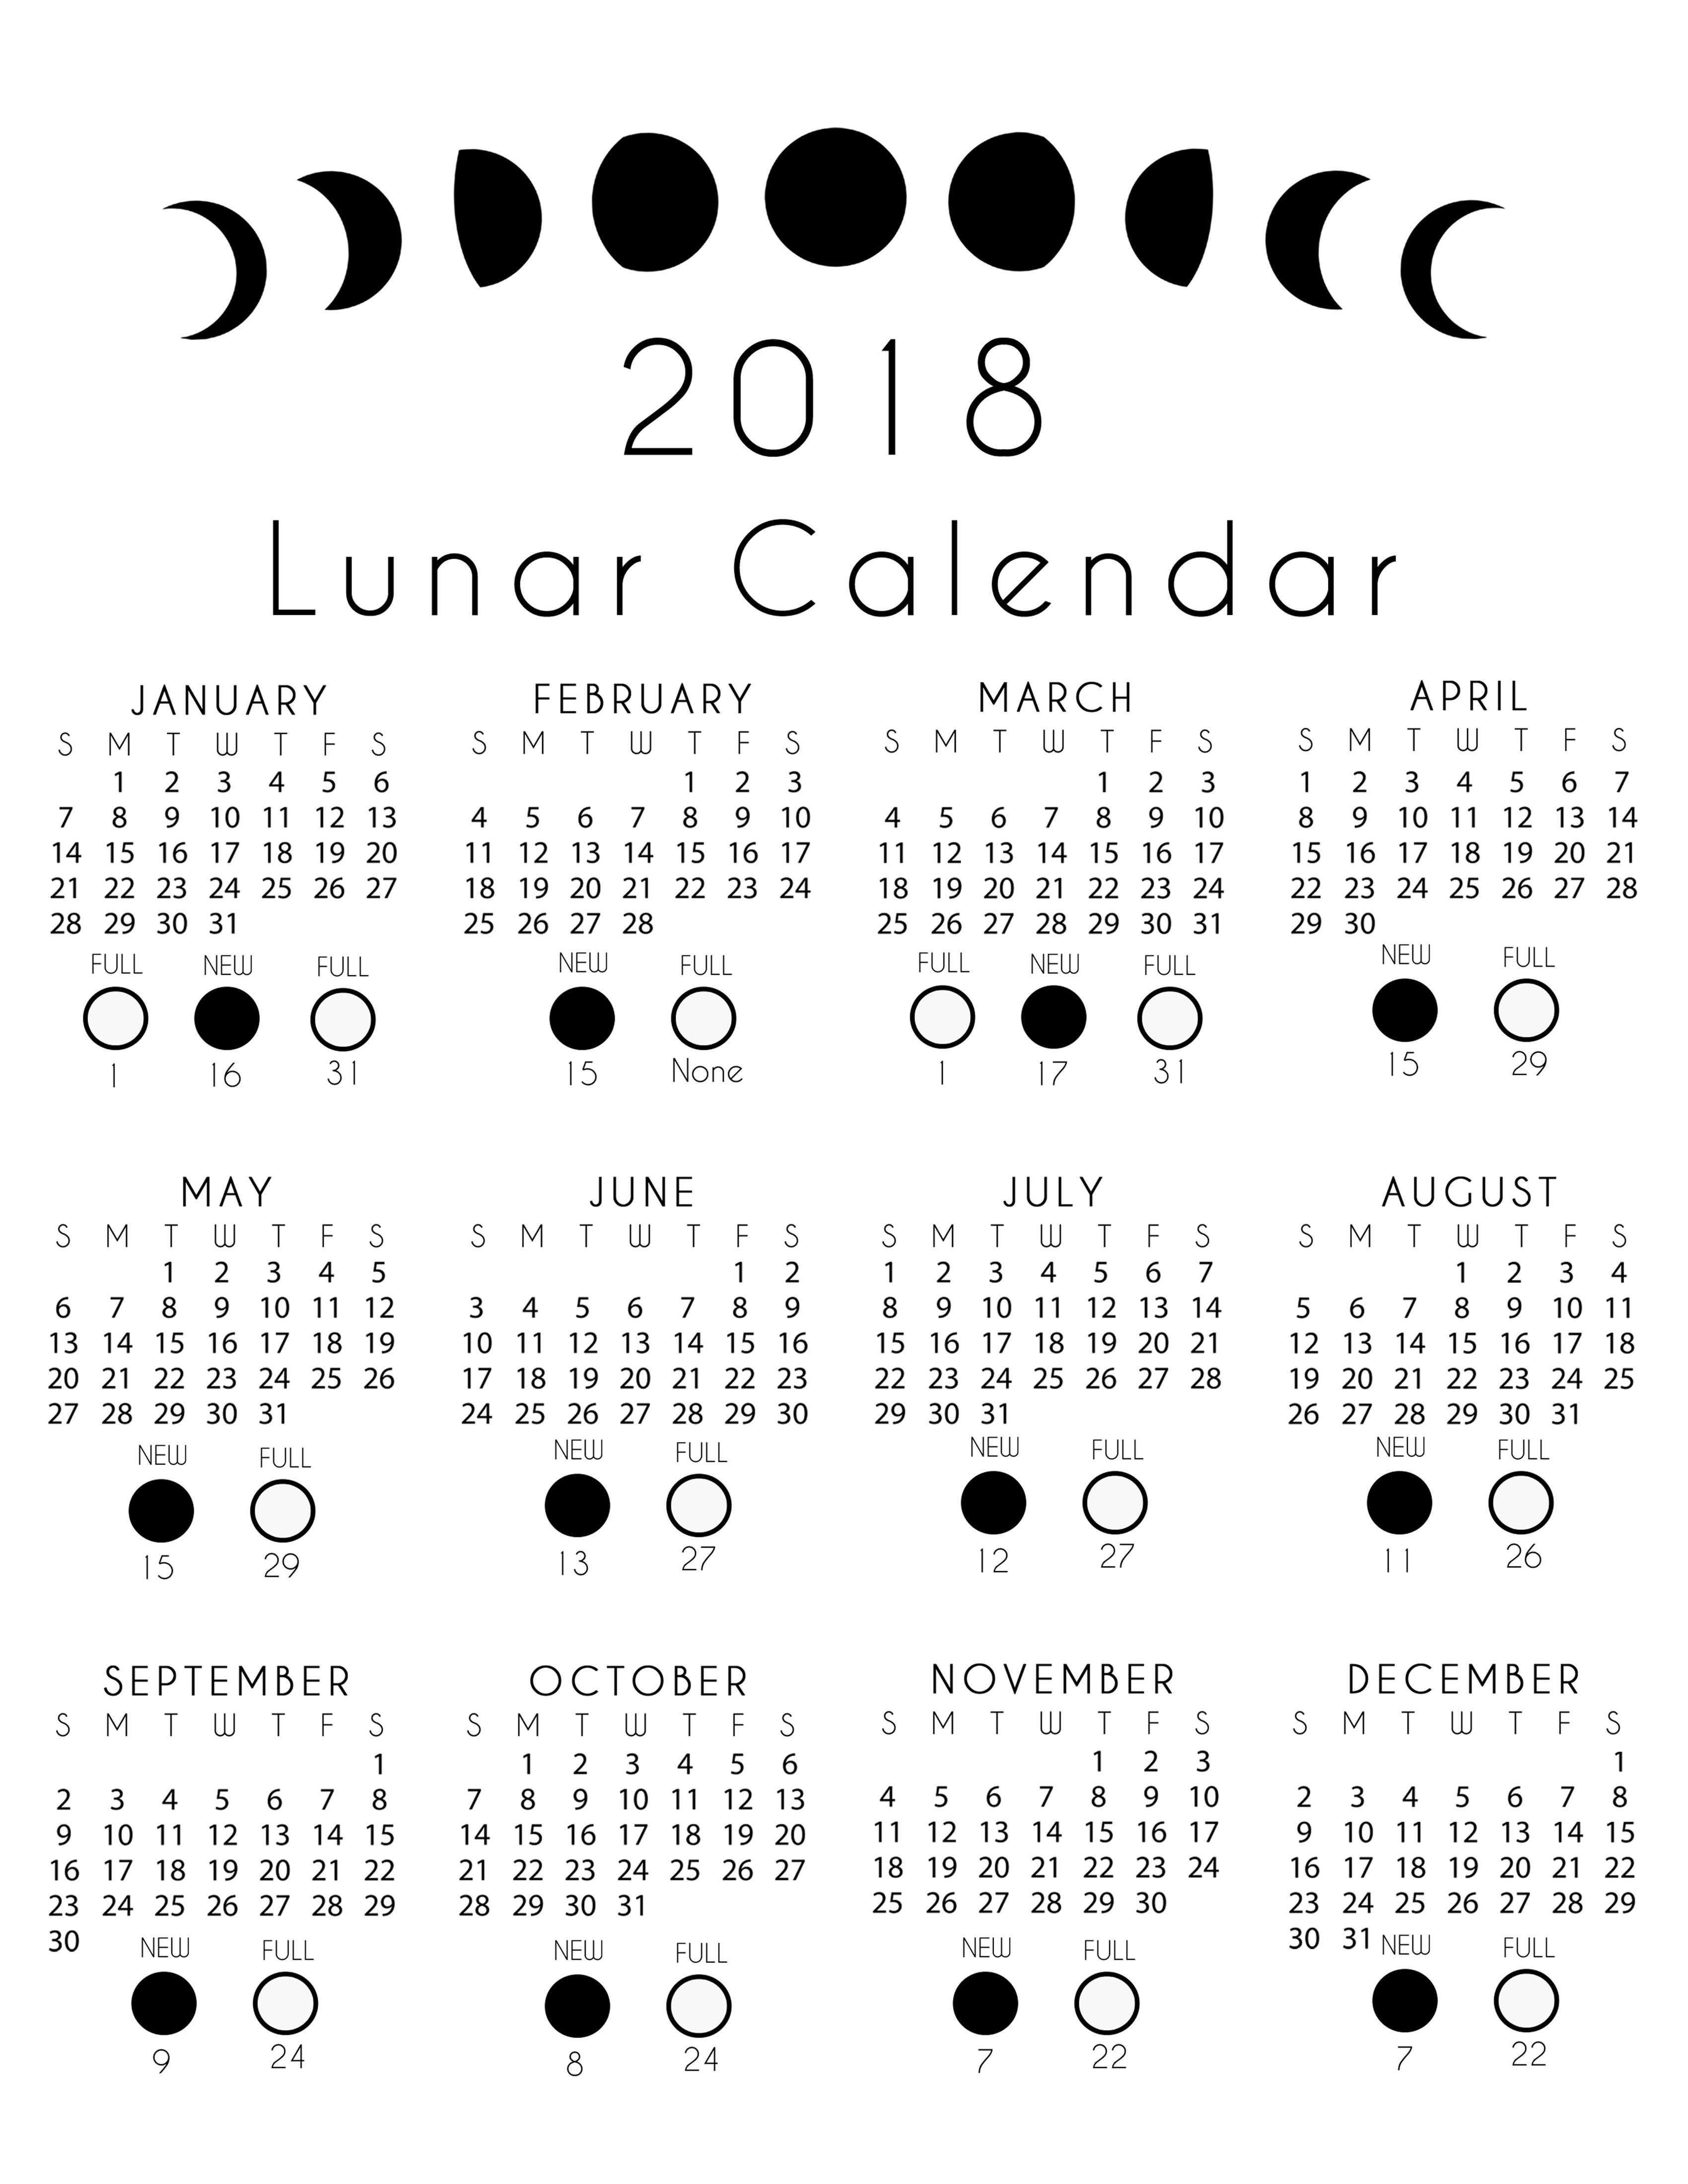 2018 Lunar Calendar Free Printout | Moon Calendar, Lunar